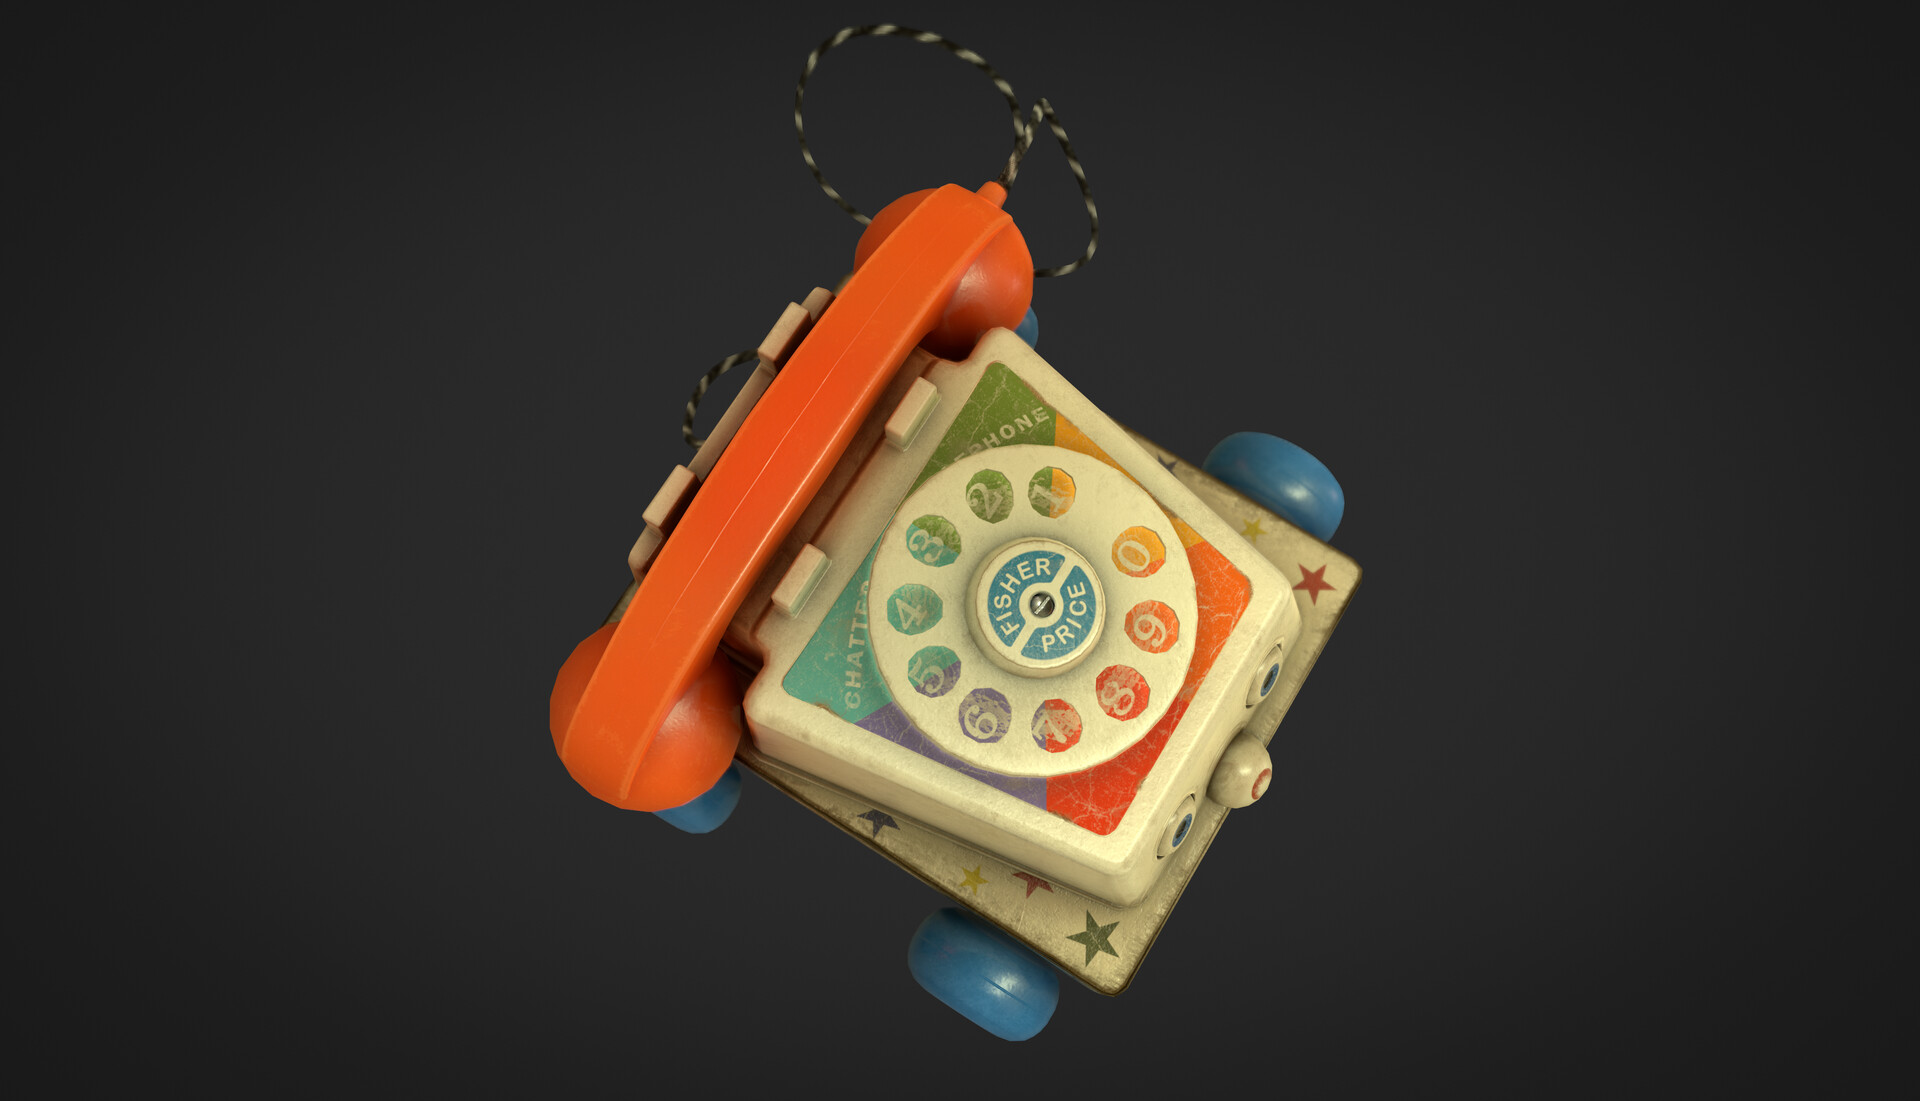 Hanna stenow chatterphone3